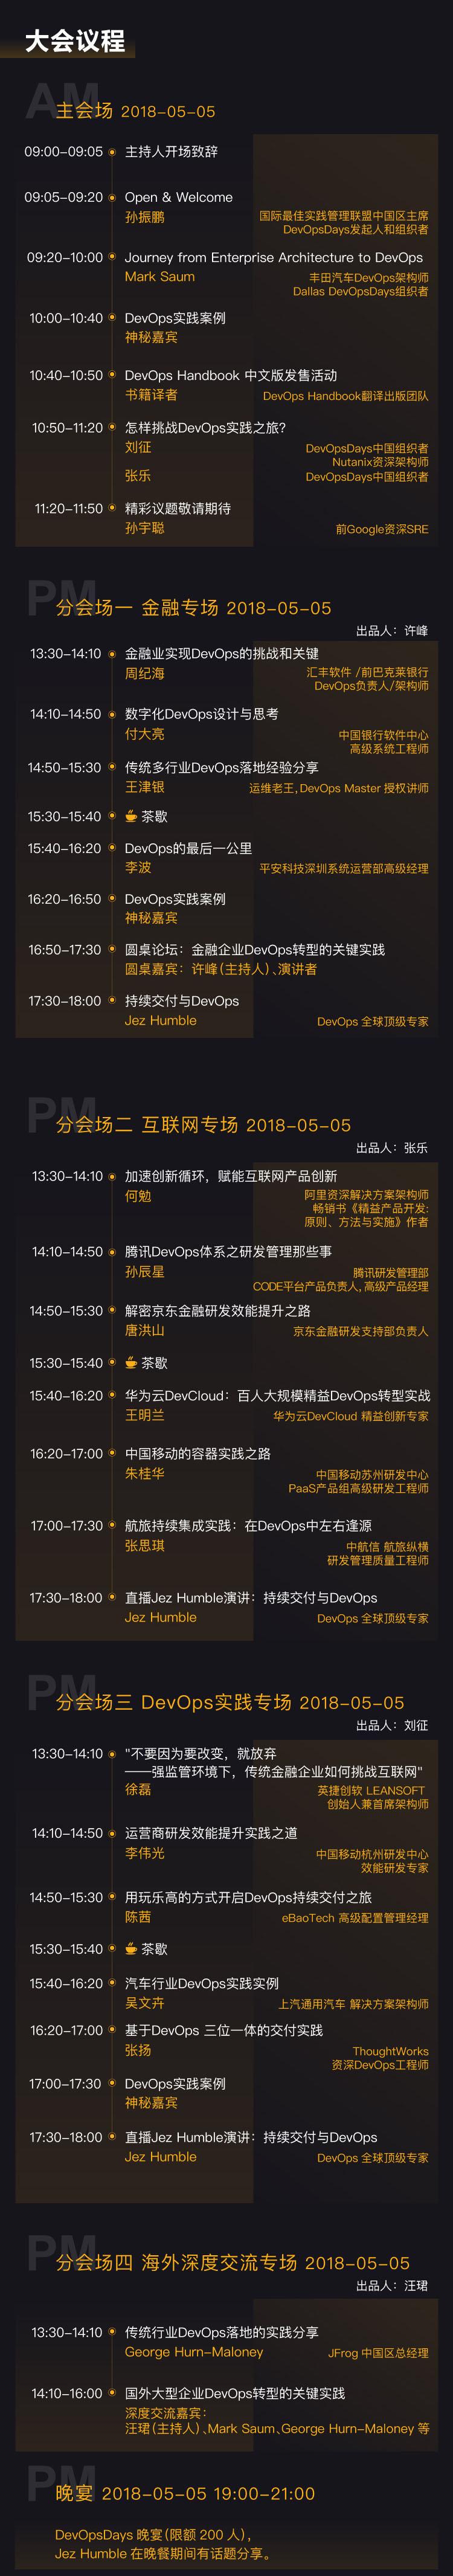 DevOpsDays Beijing 2018leangoo会议议程